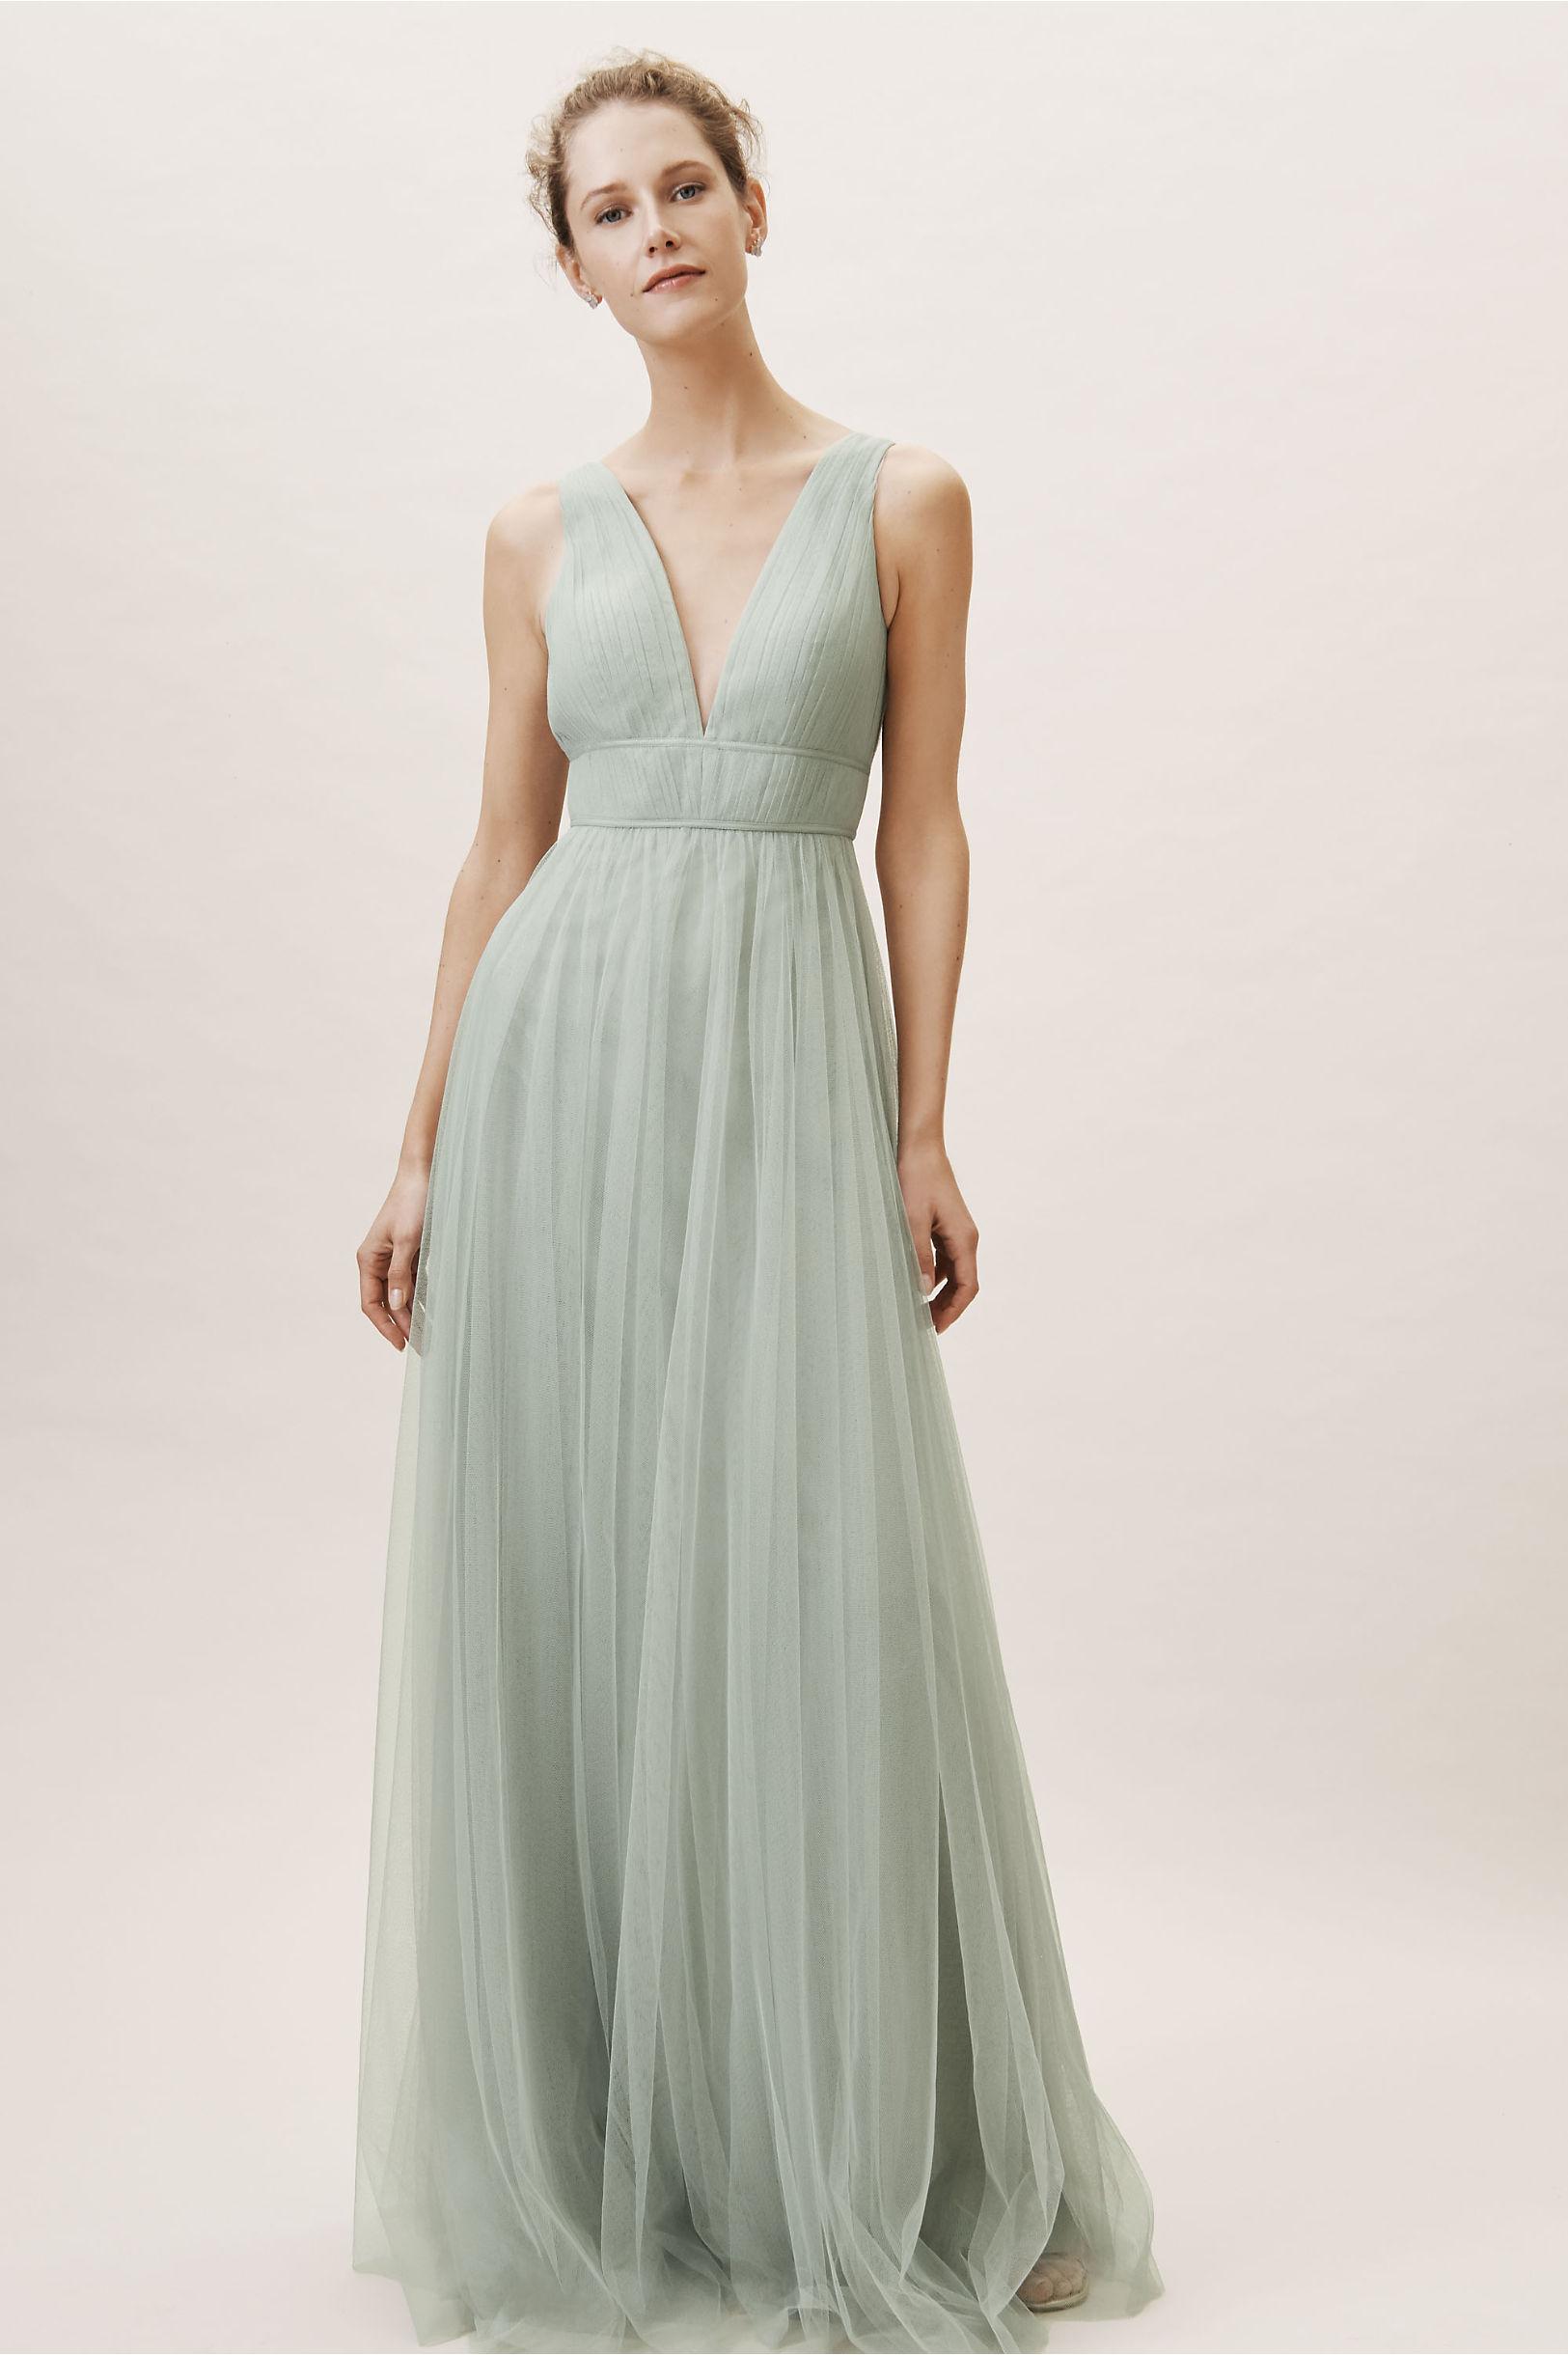 650e1ae056 Sarita Dress Morning Mist in Bridesmaids   Bridal Party